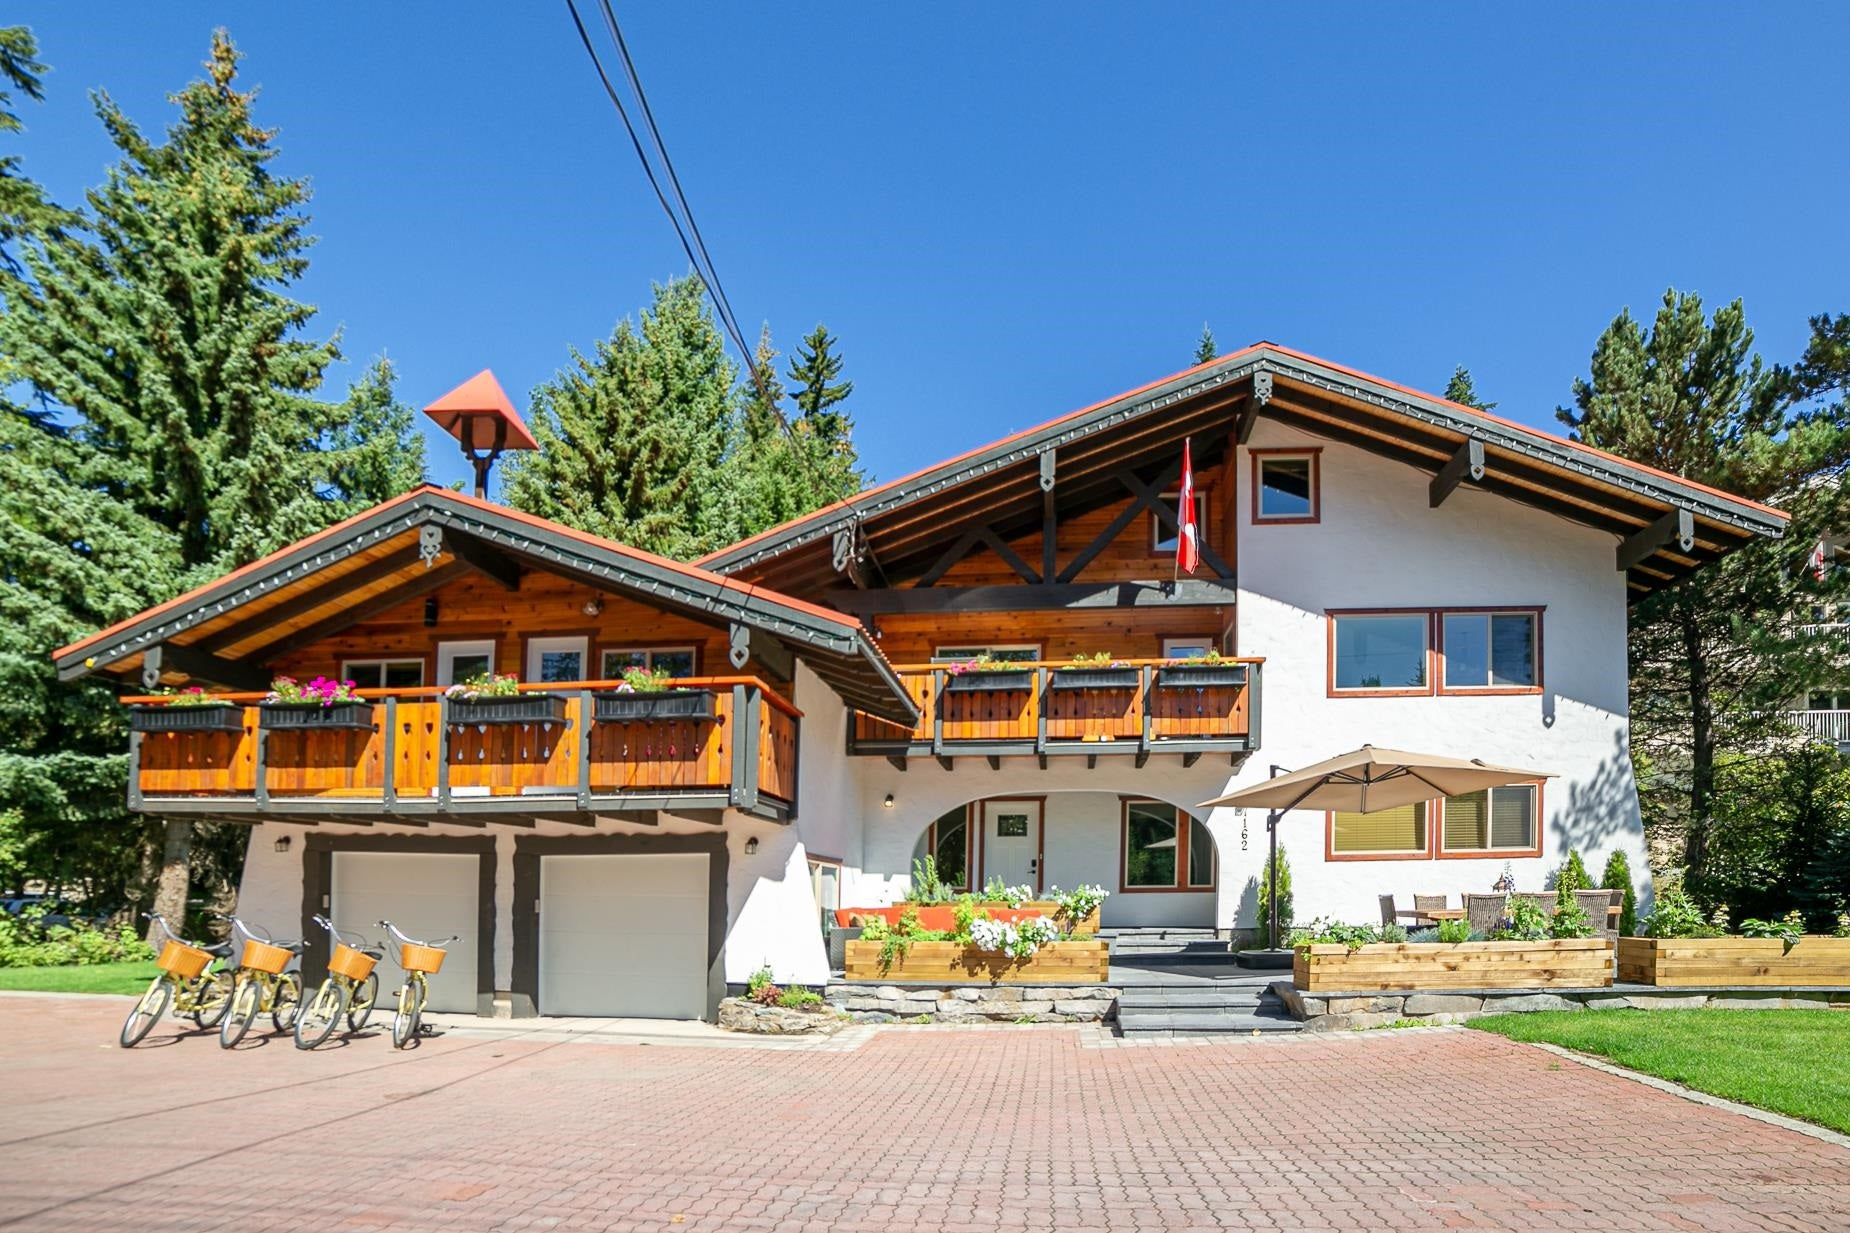 7162 NANCY GREENE DRIVE - White Gold House/Single Family for sale, 8 Bedrooms (R2614539)